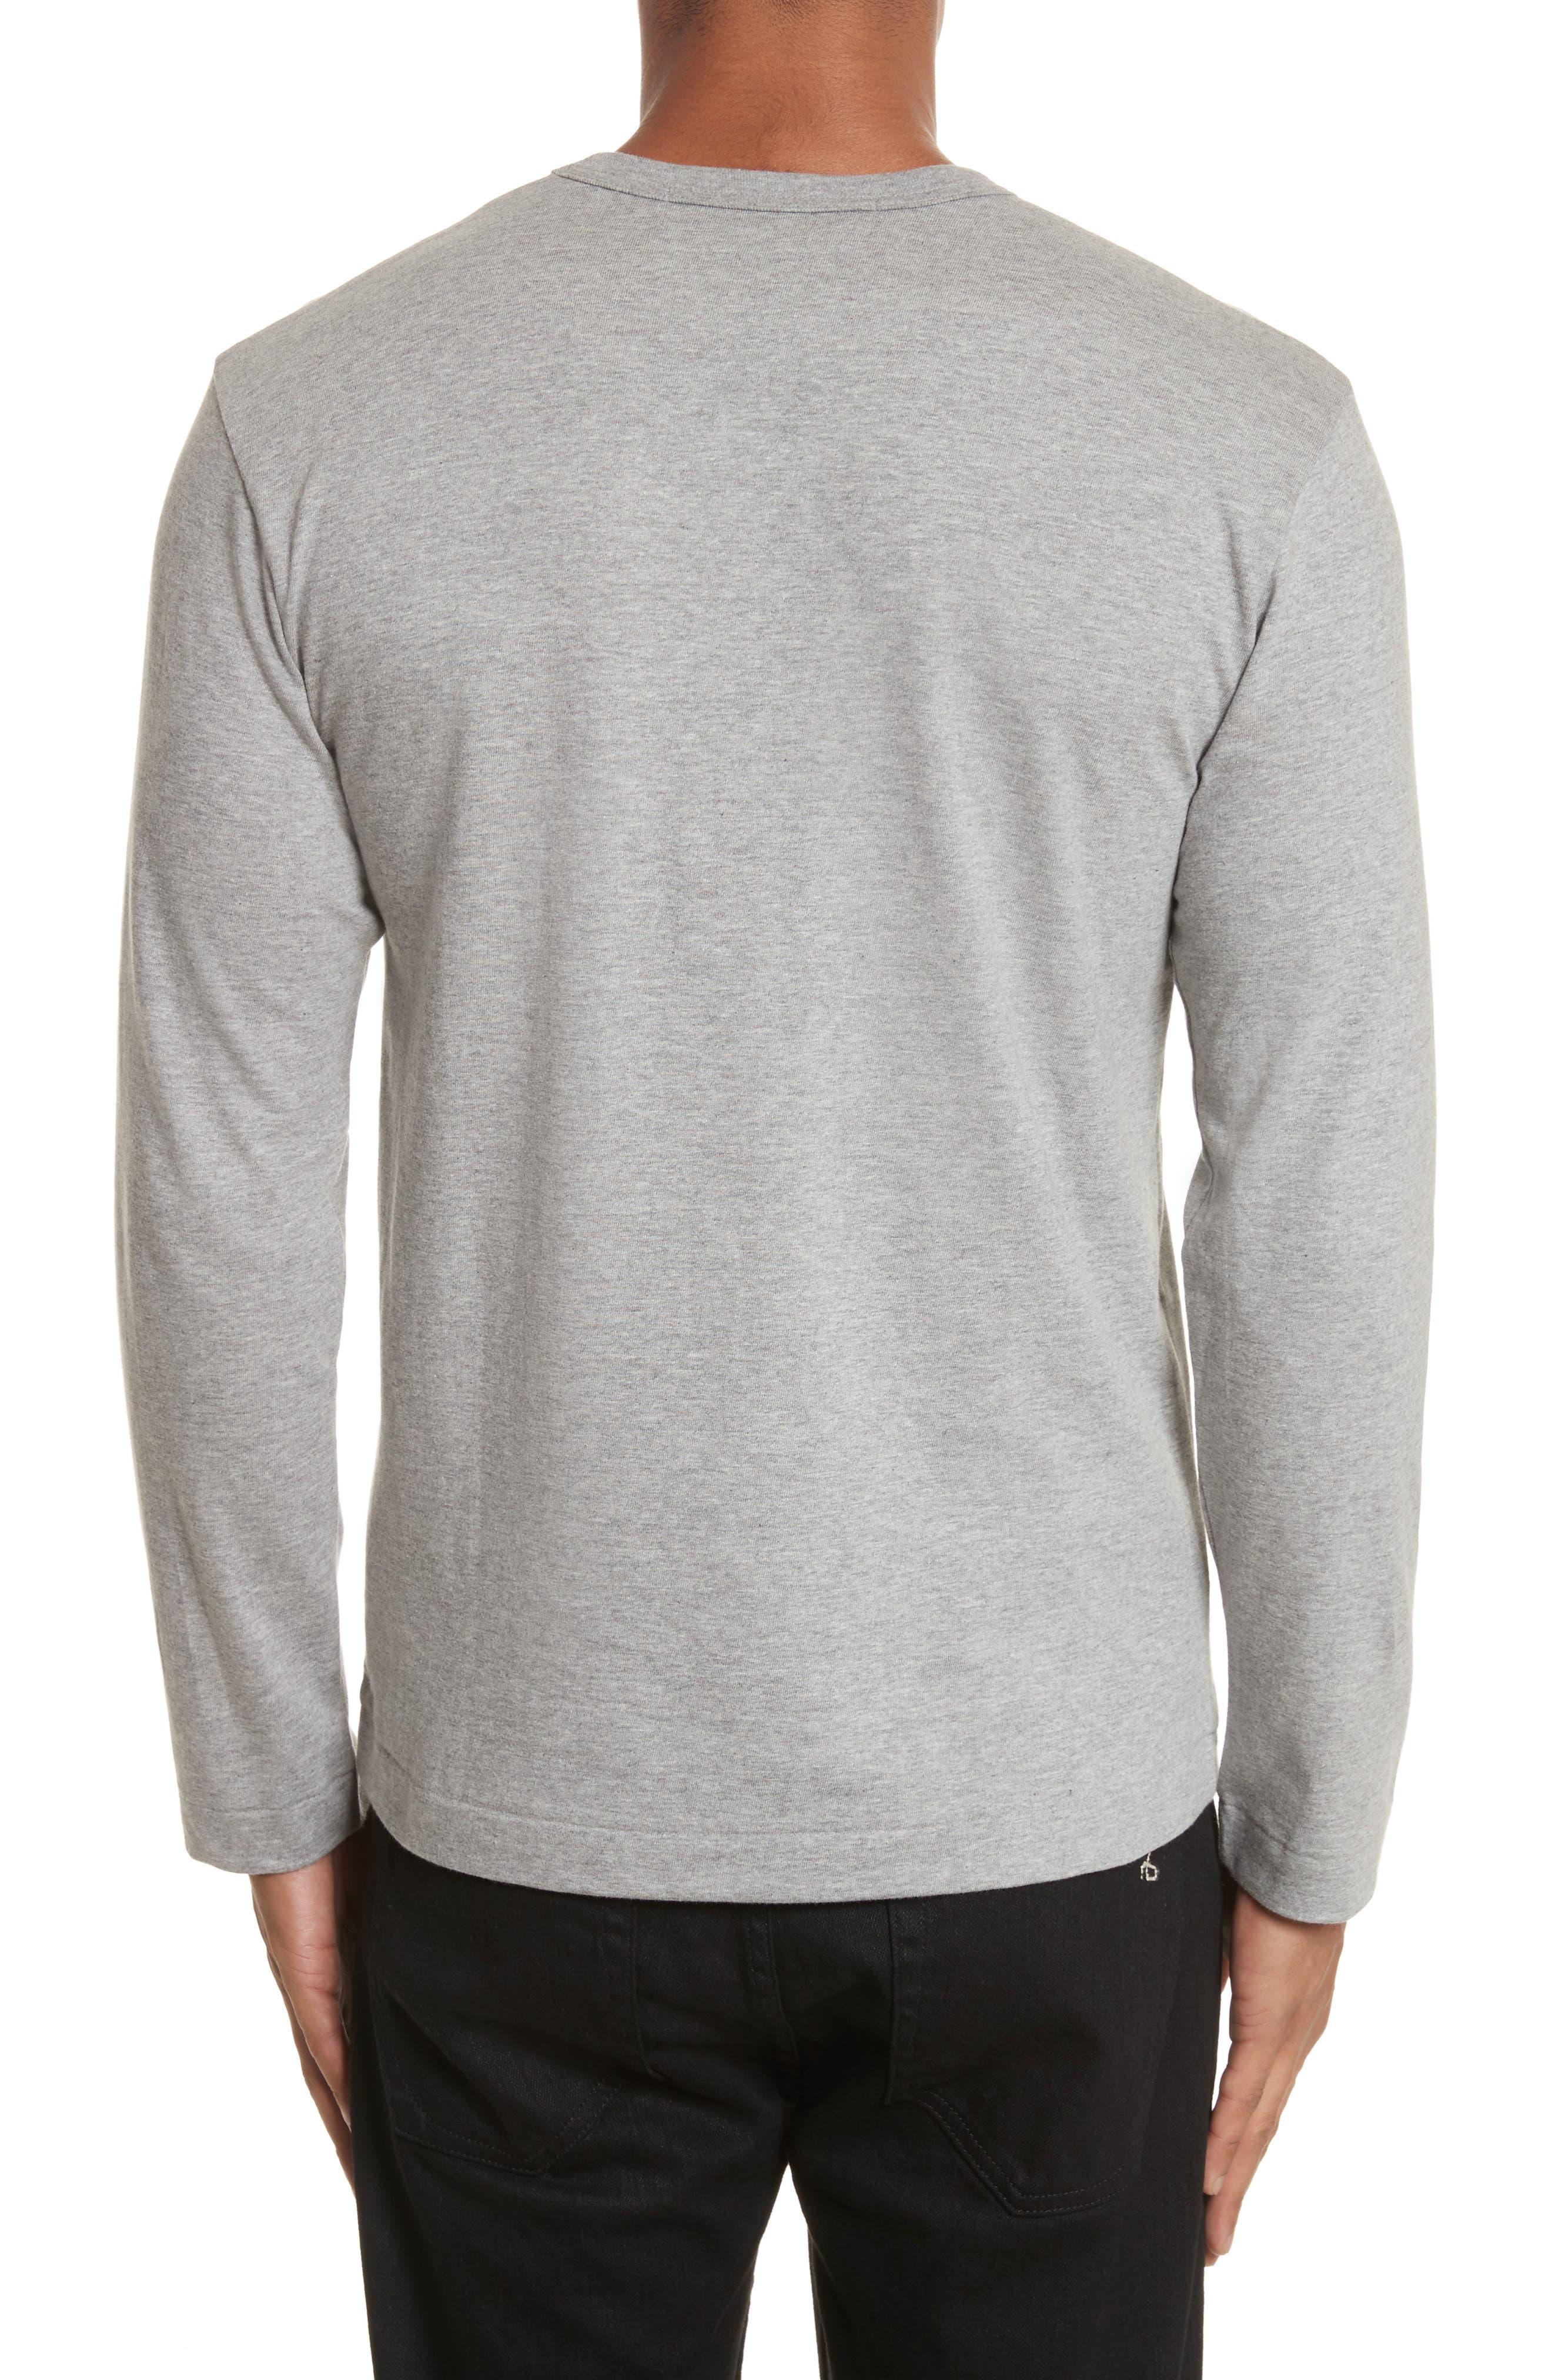 PLAY Long Sleeve T-Shirt,                             Alternate thumbnail 2, color,                             Grey